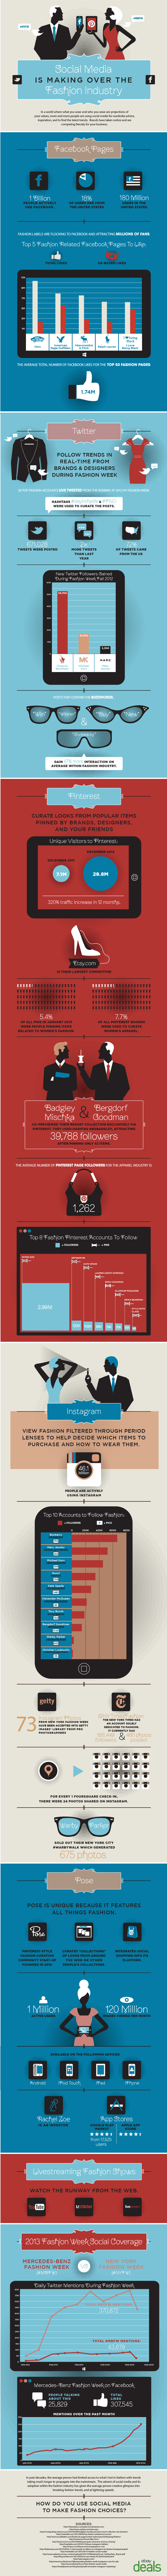 Social Medias Impact on Fashion Industry